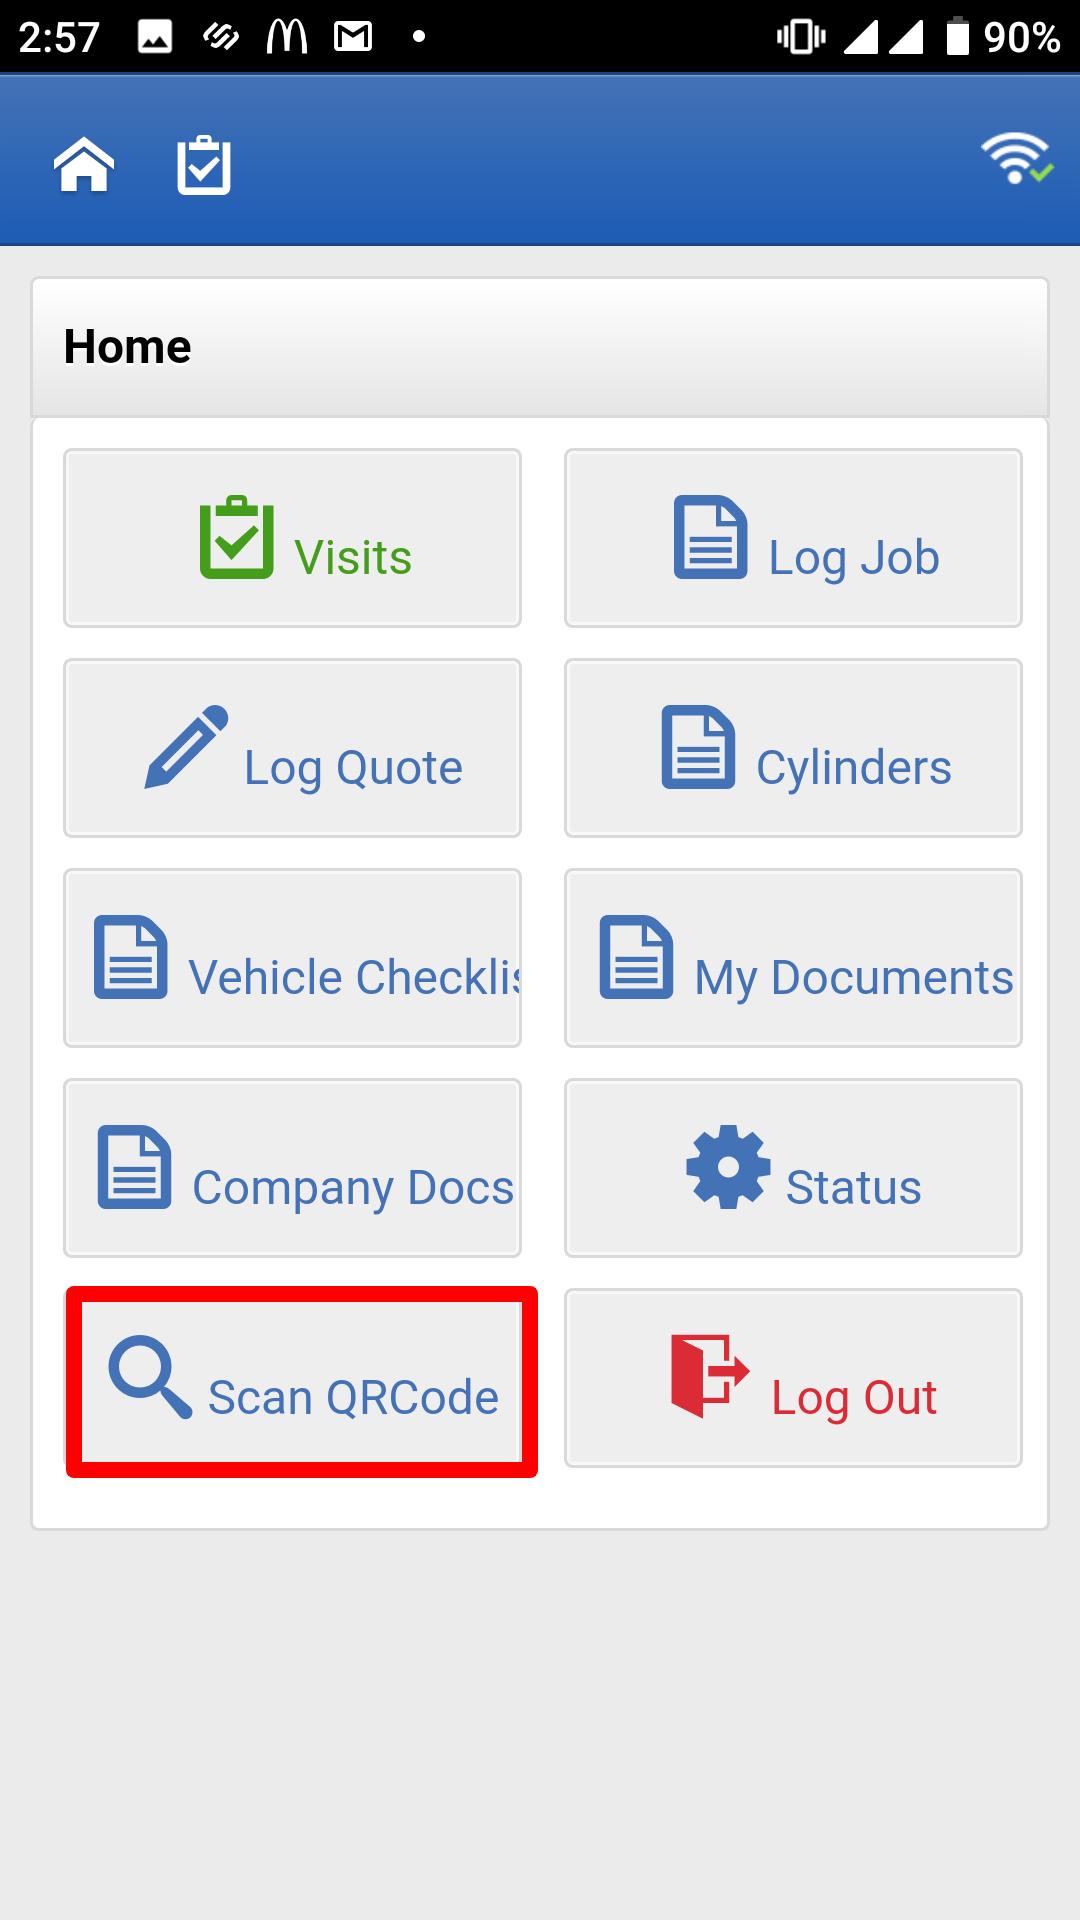 Figure 2: Joblogic Mobile - Home screen